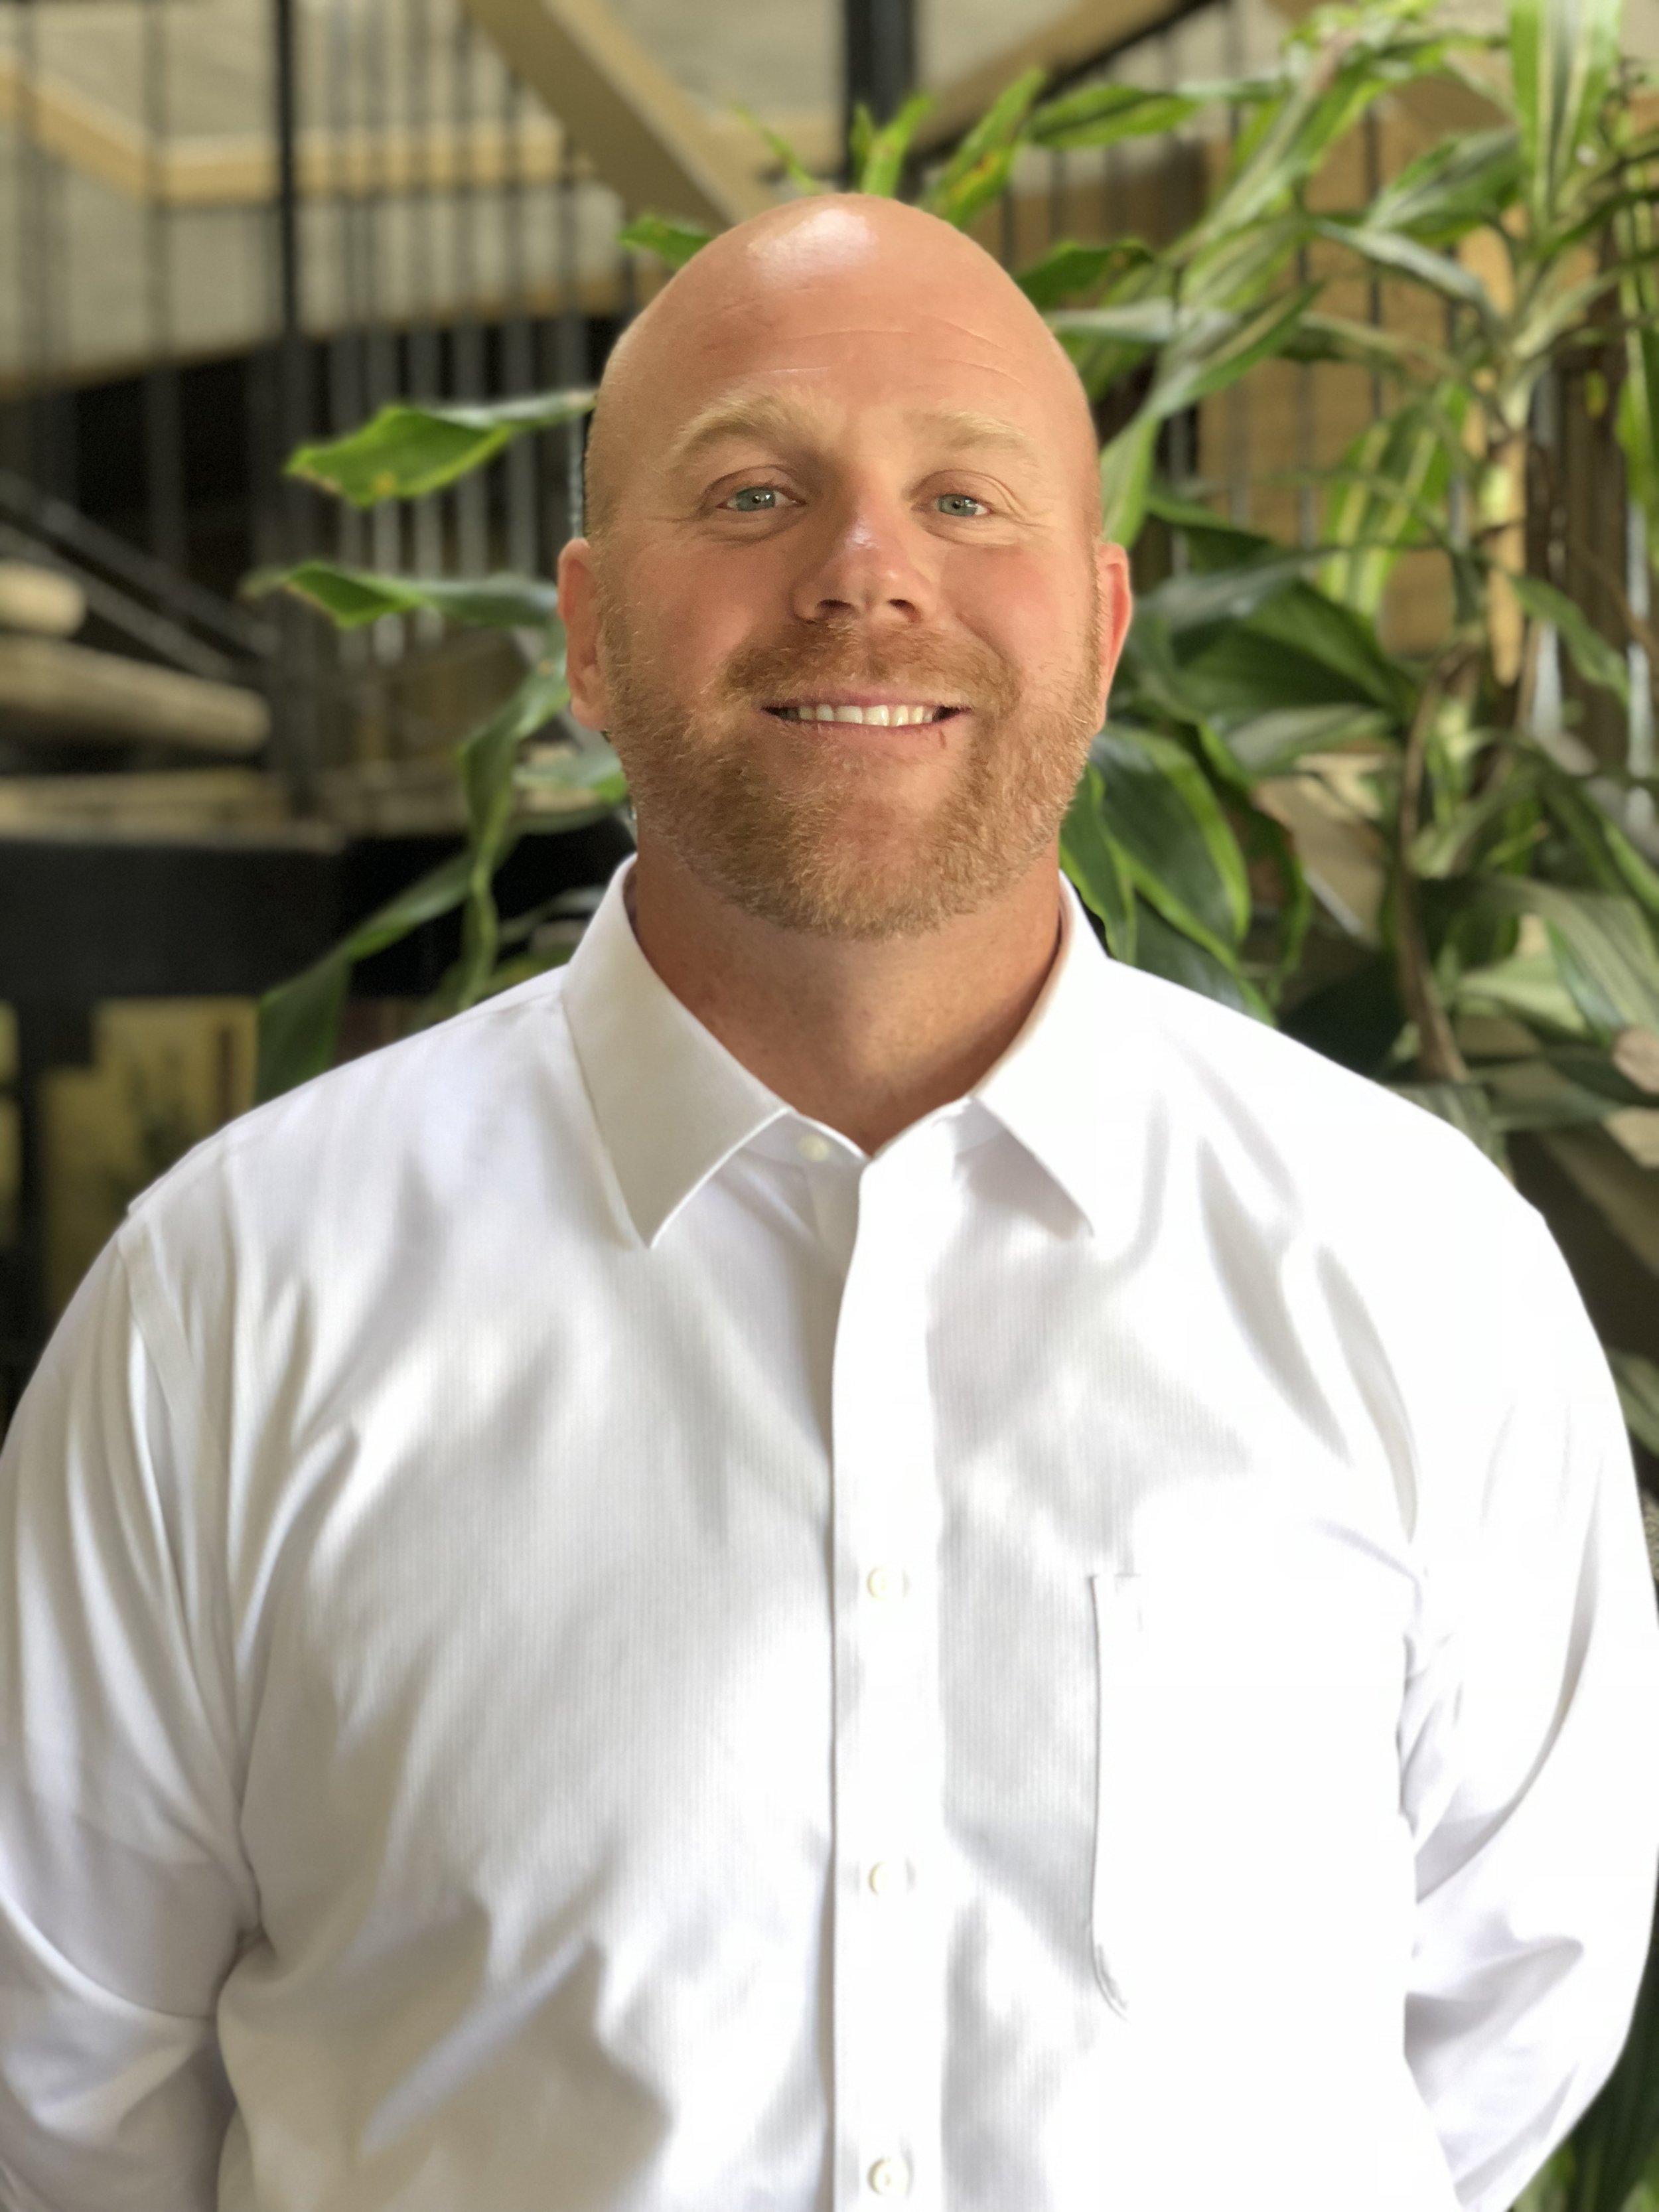 Ryan Hoke - Ryan Hoke started with AIM in 2000.